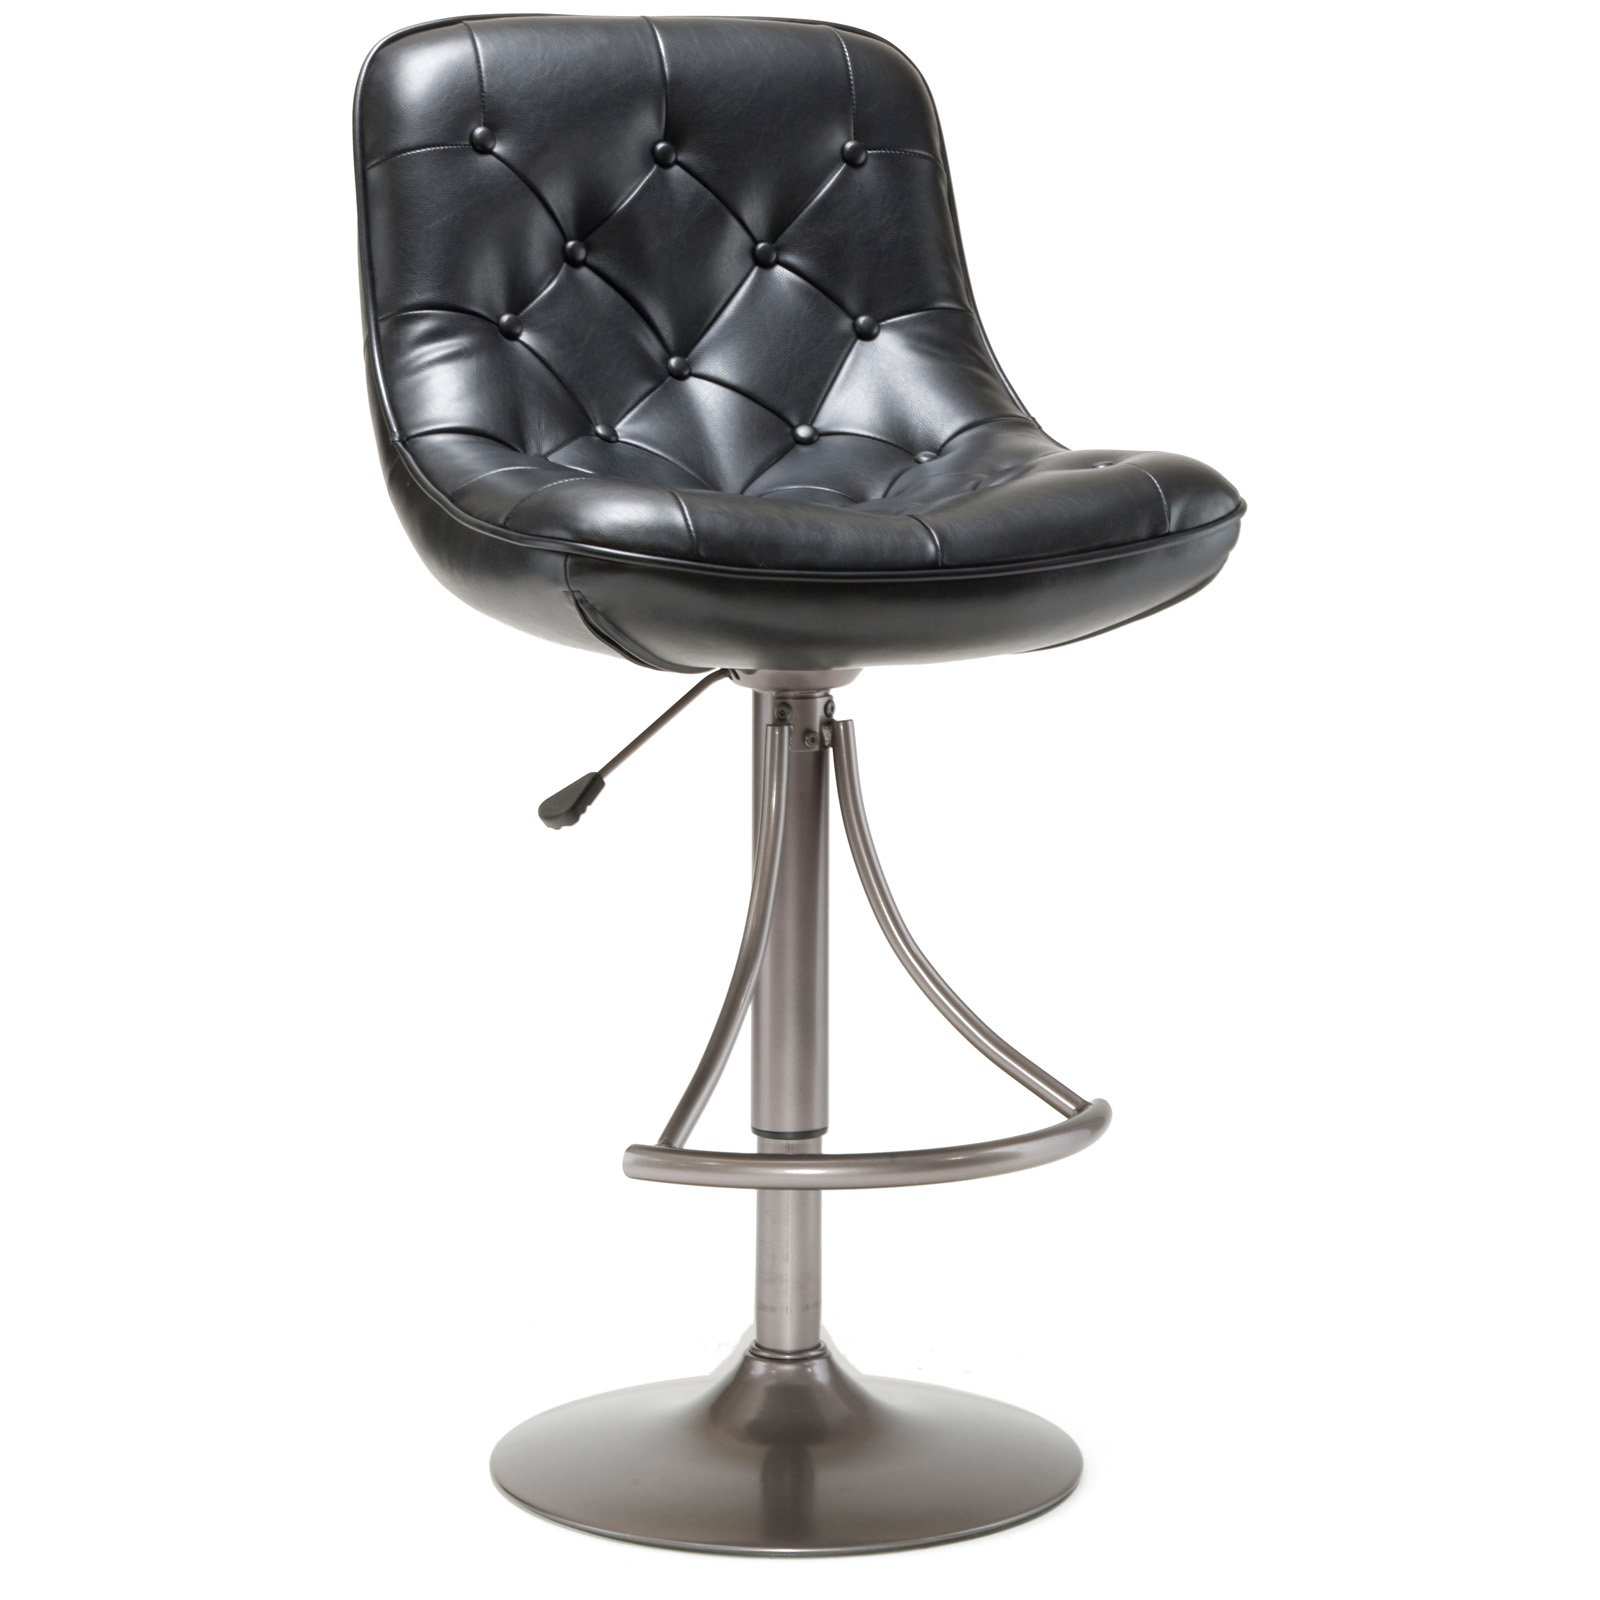 Hillsdale Furniture Aspen Adjustable Bar Stool, Oyster Gray Finish by Hillsdale Furniture LLC